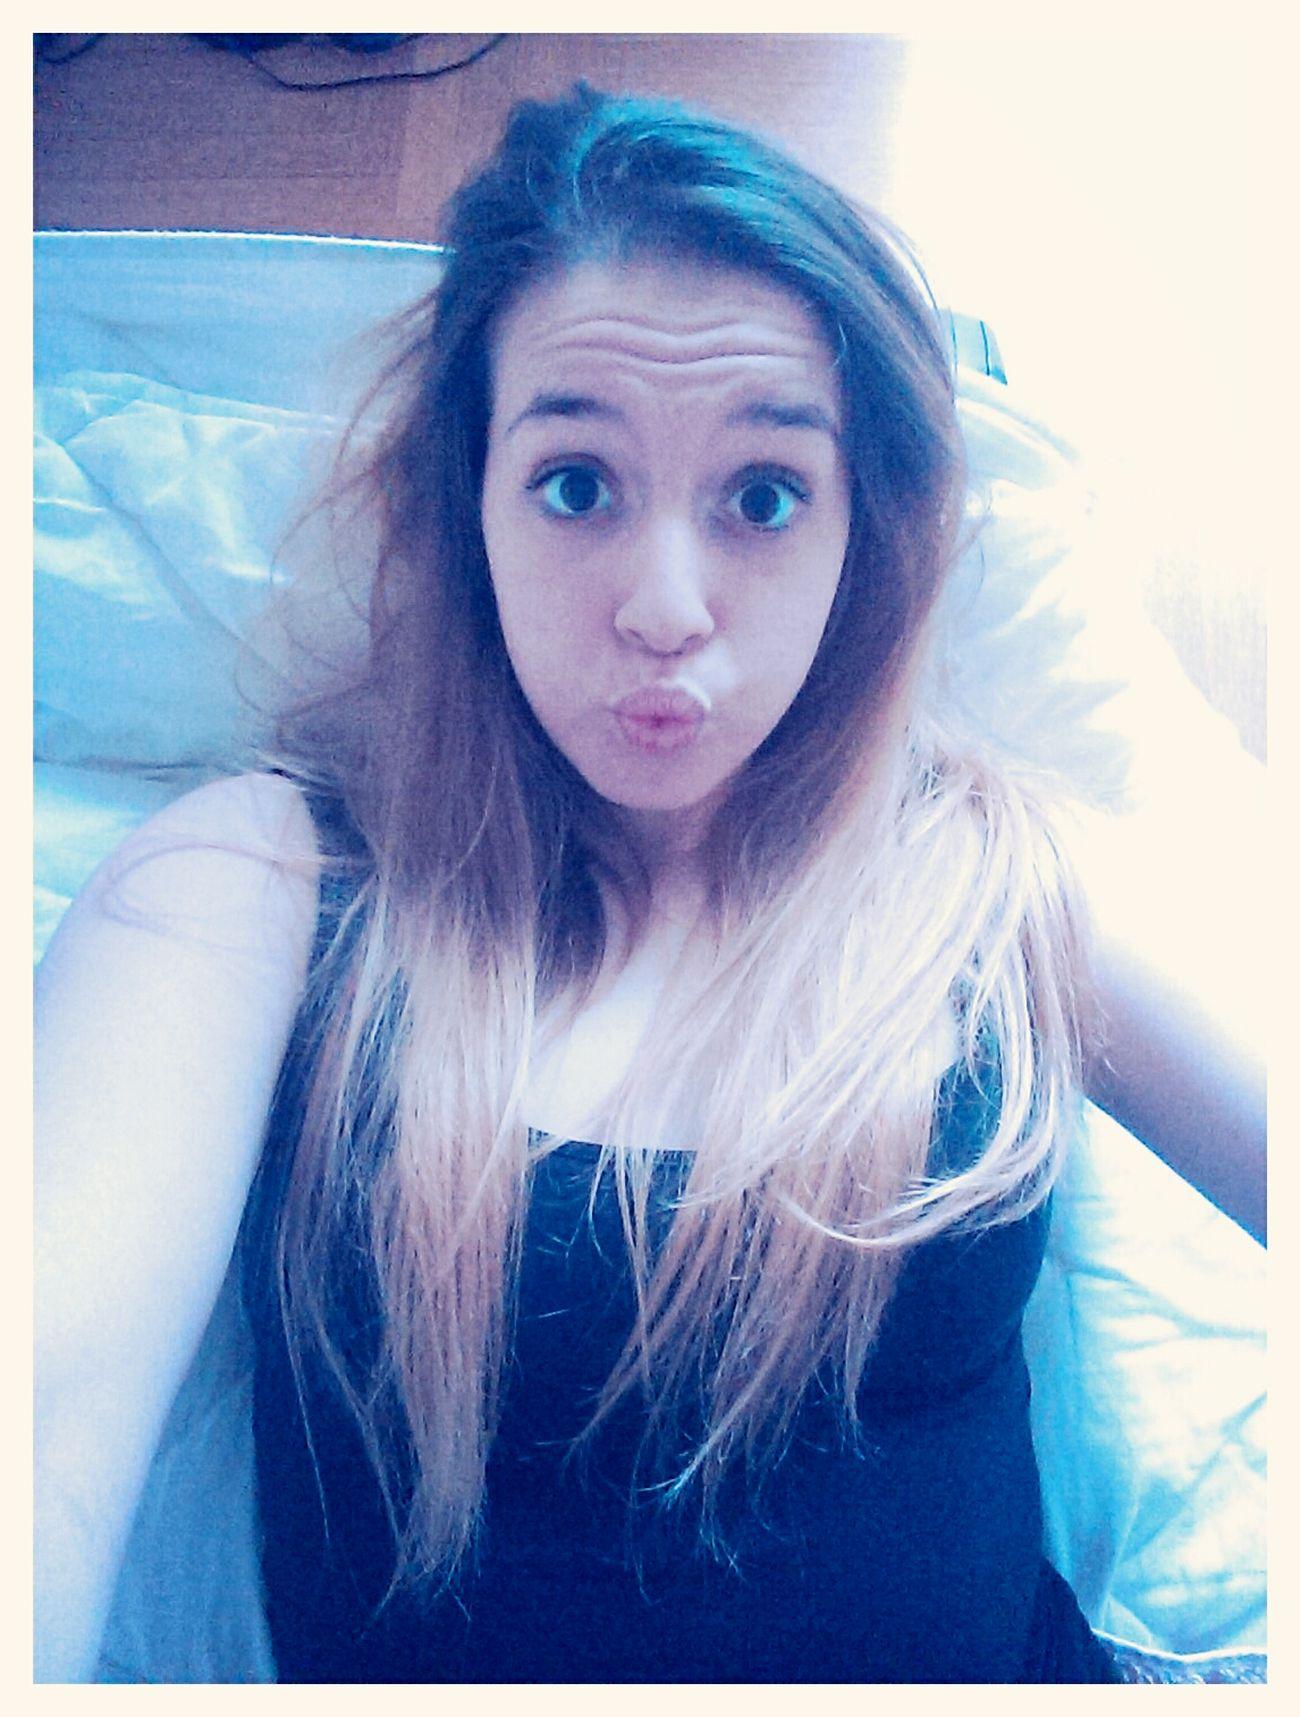 Me Selfie HTC_photography Kiss